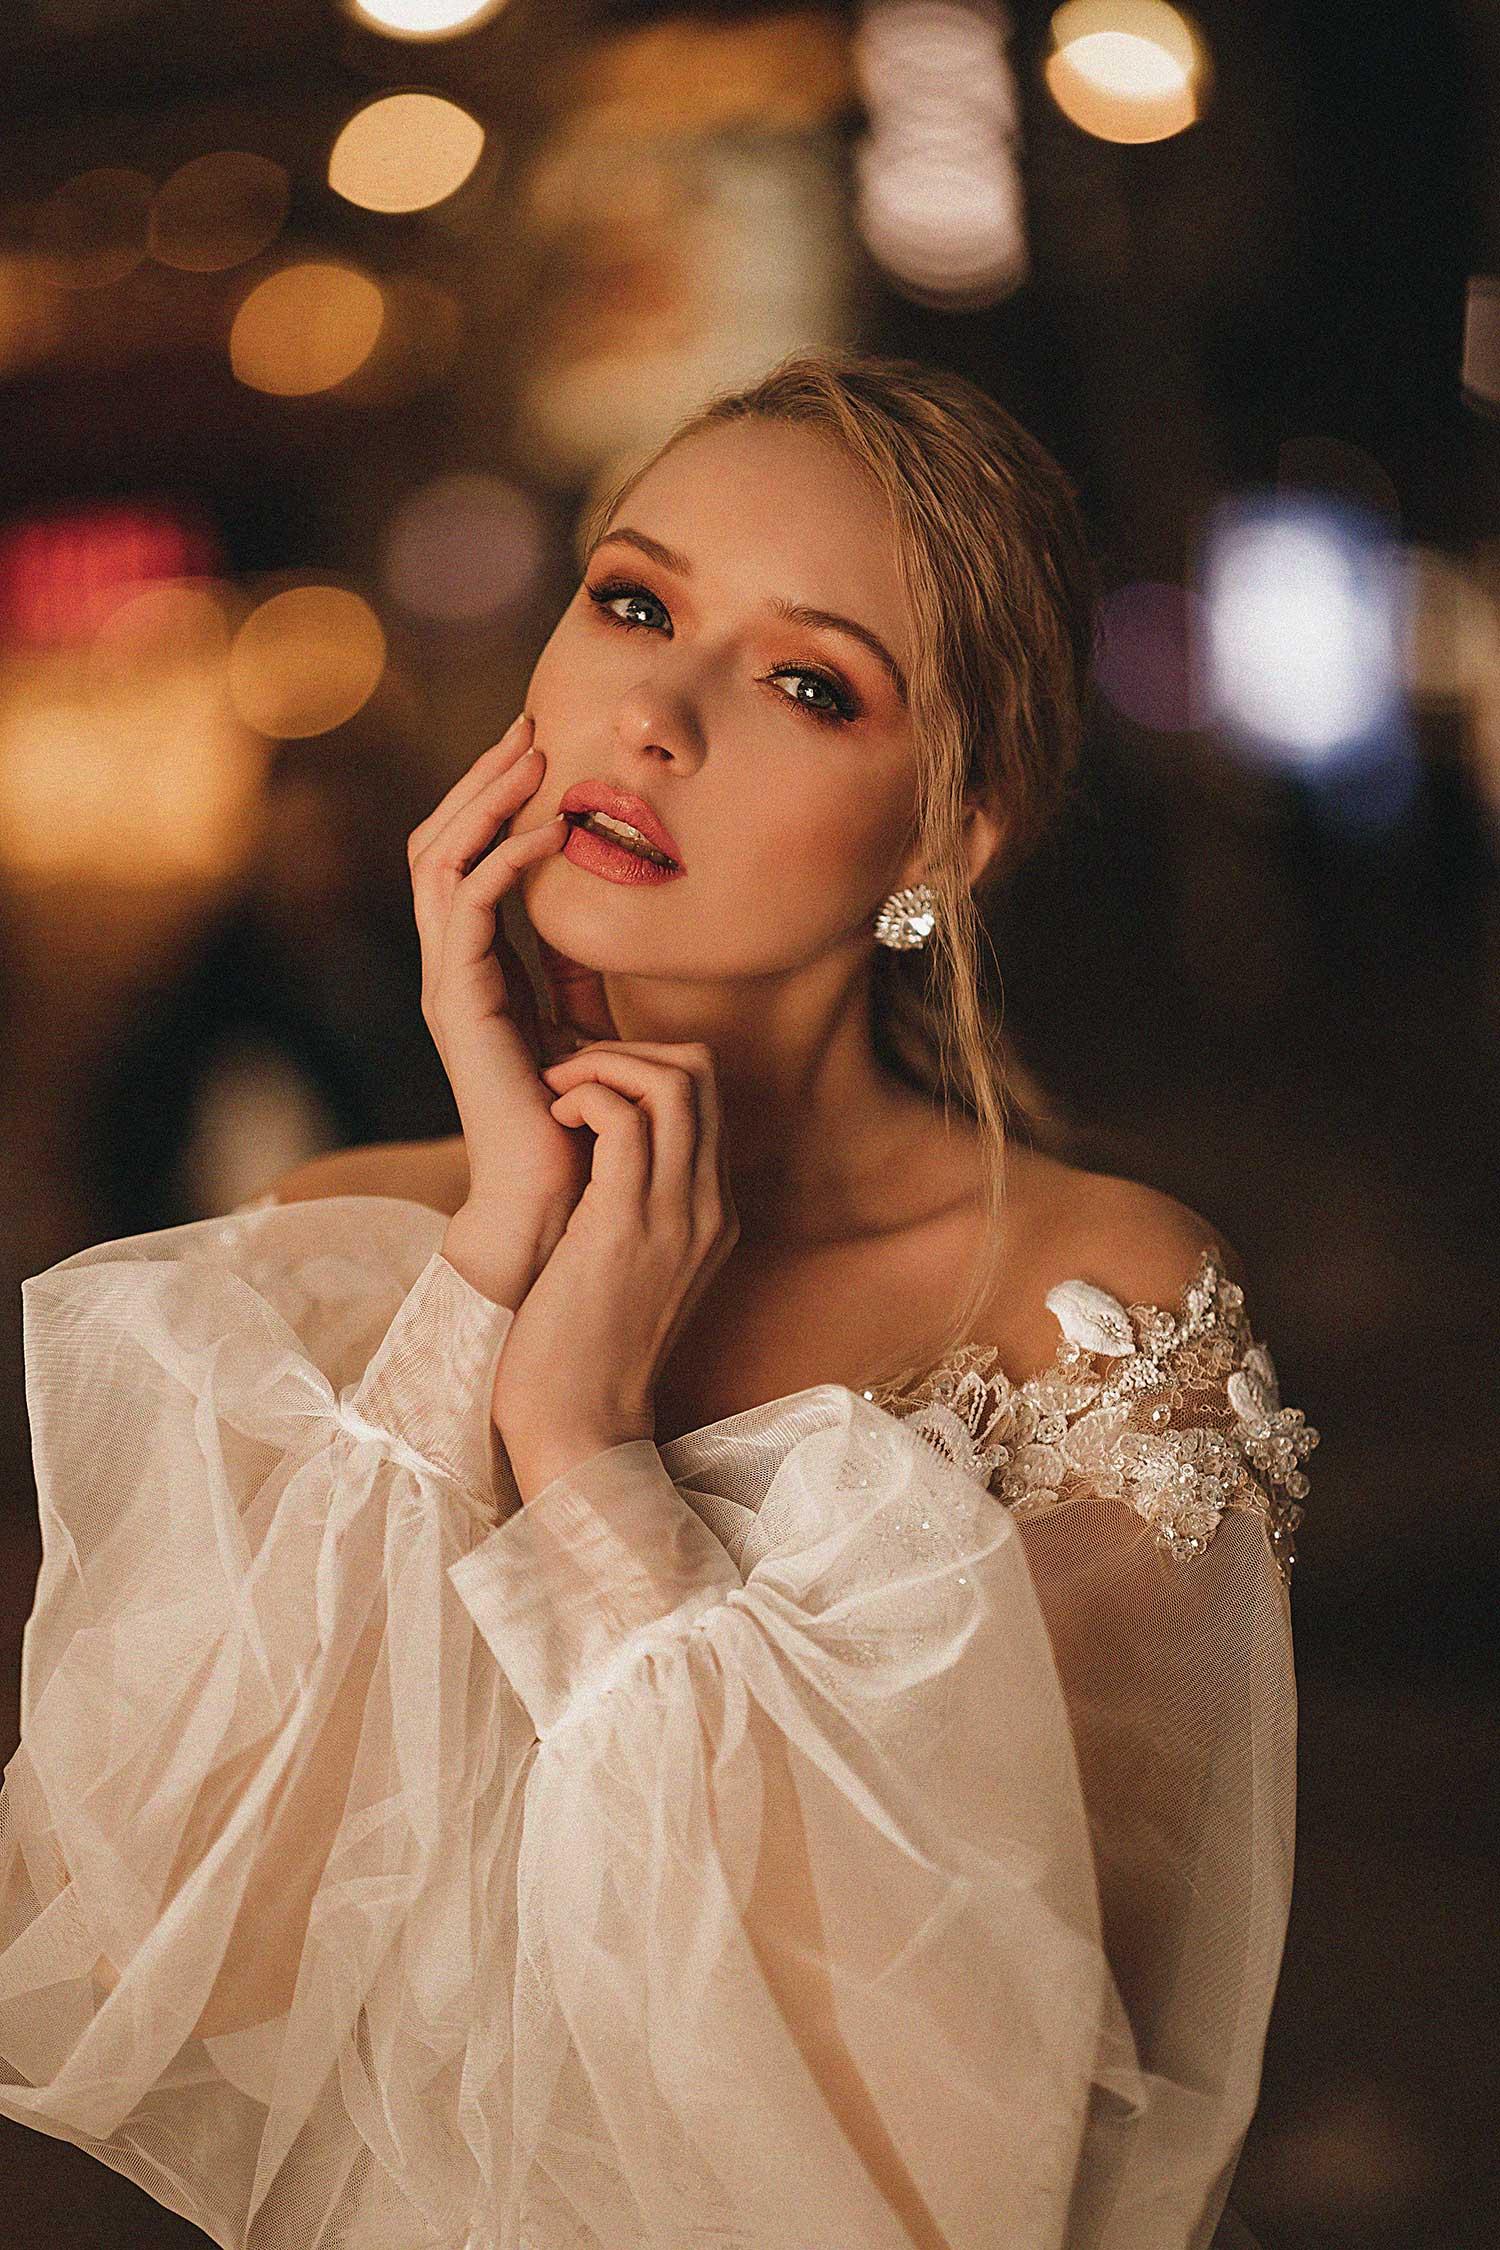 Bride posing at night